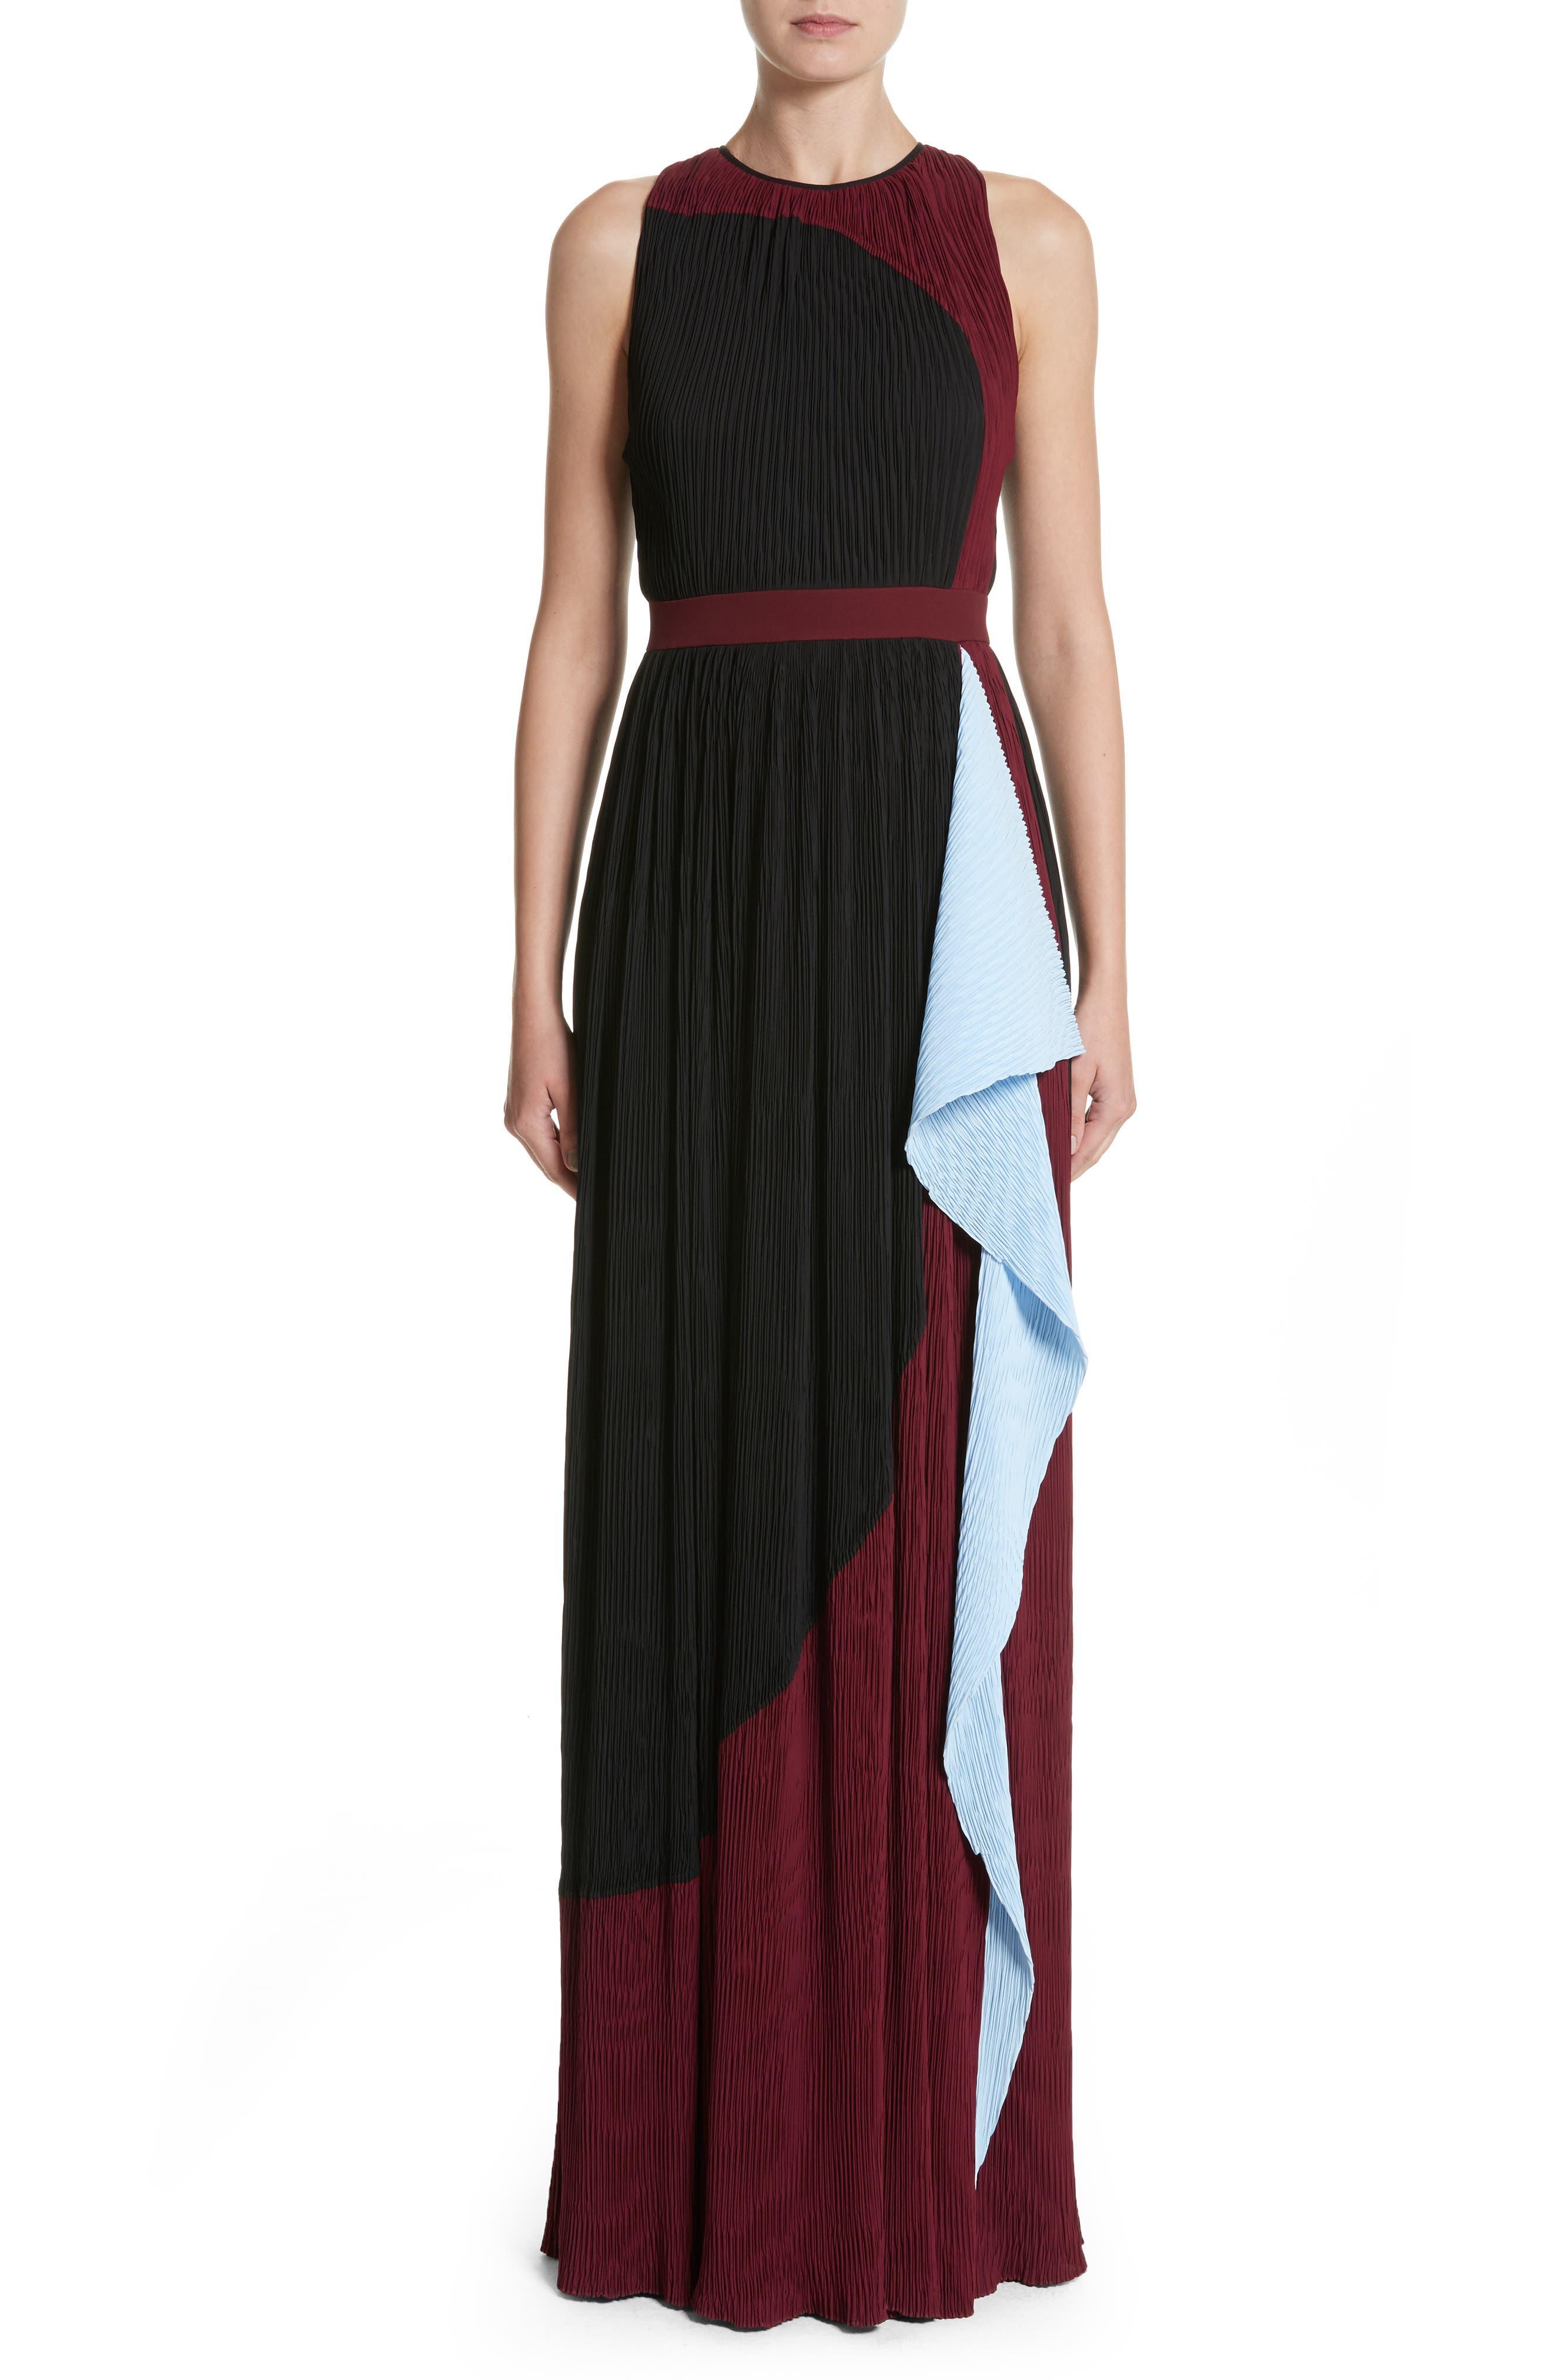 Milda Crystal Pleat Dress,                         Main,                         color, Black/Chestnut/Sky